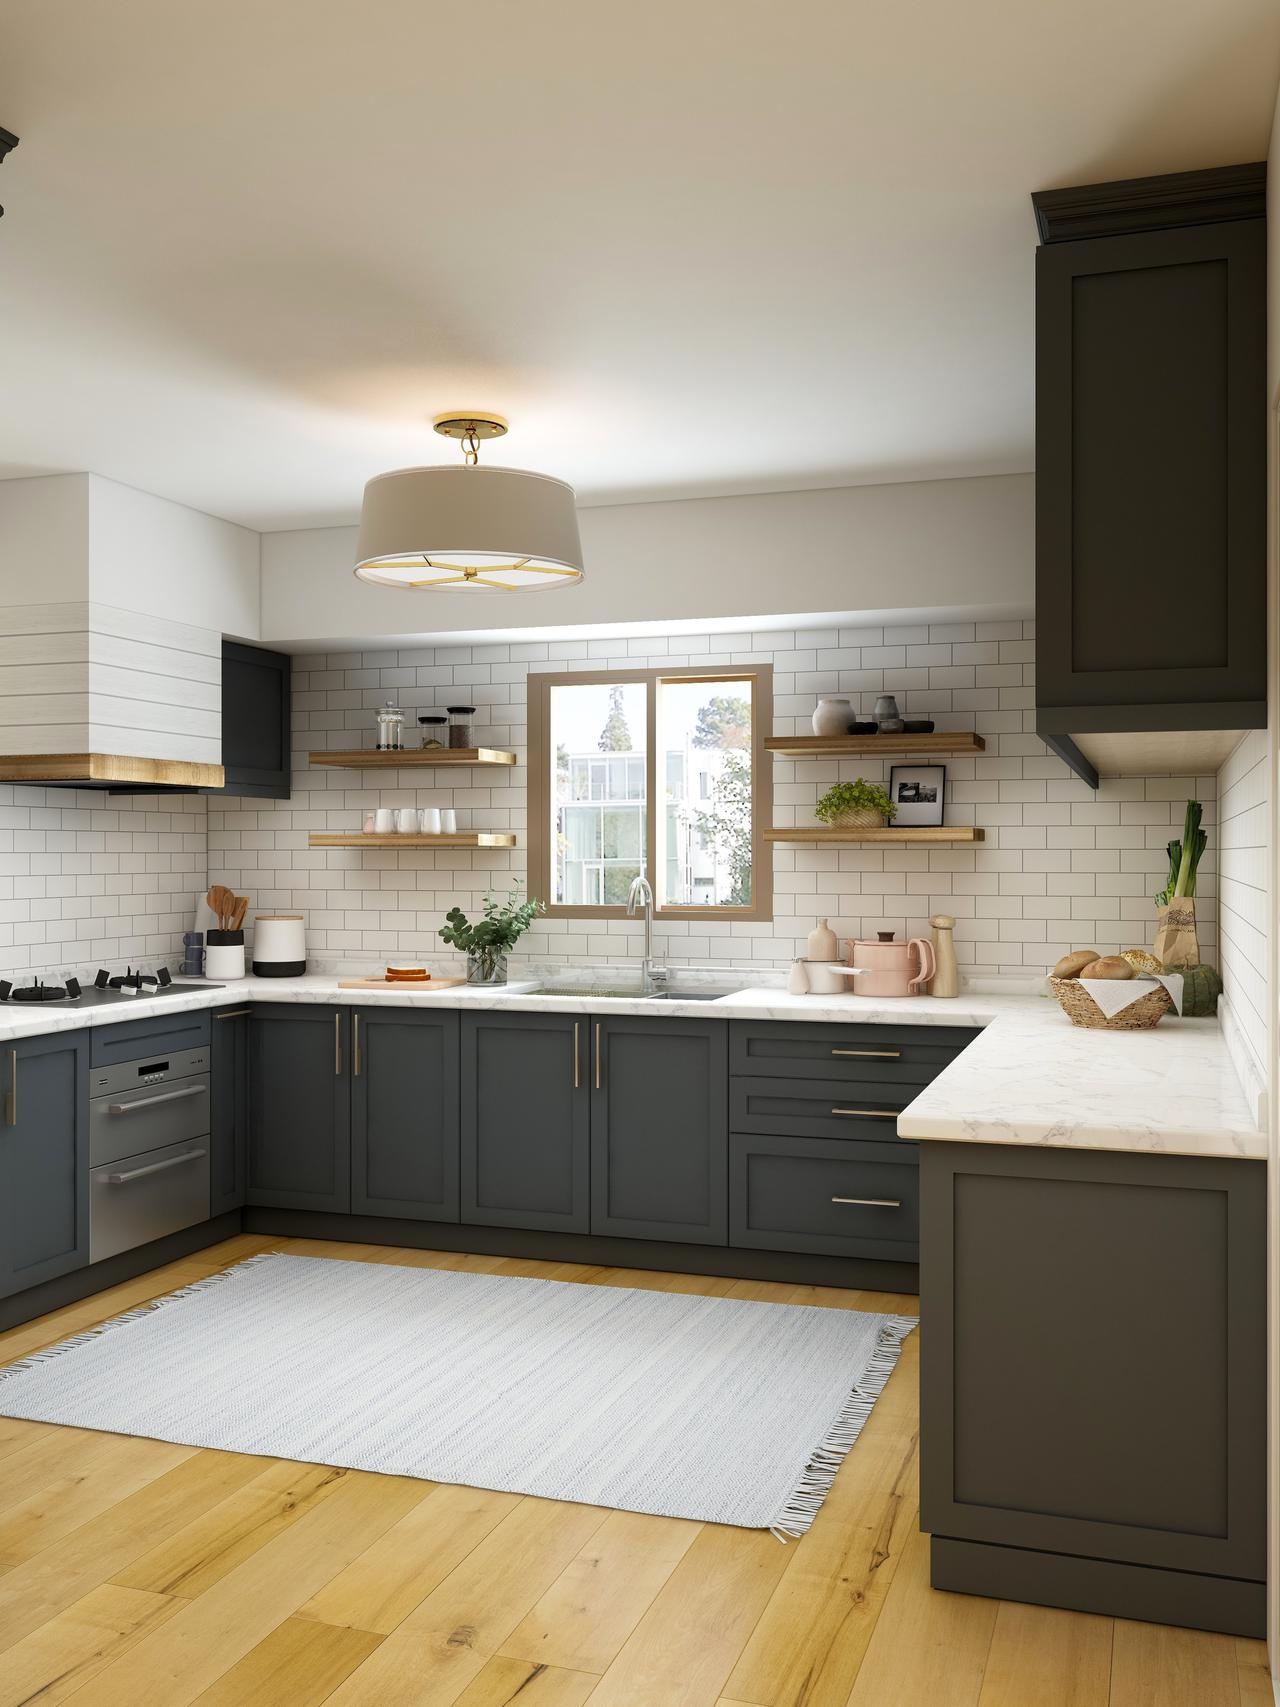 Top tips for kitchen remodel prep in West Covina